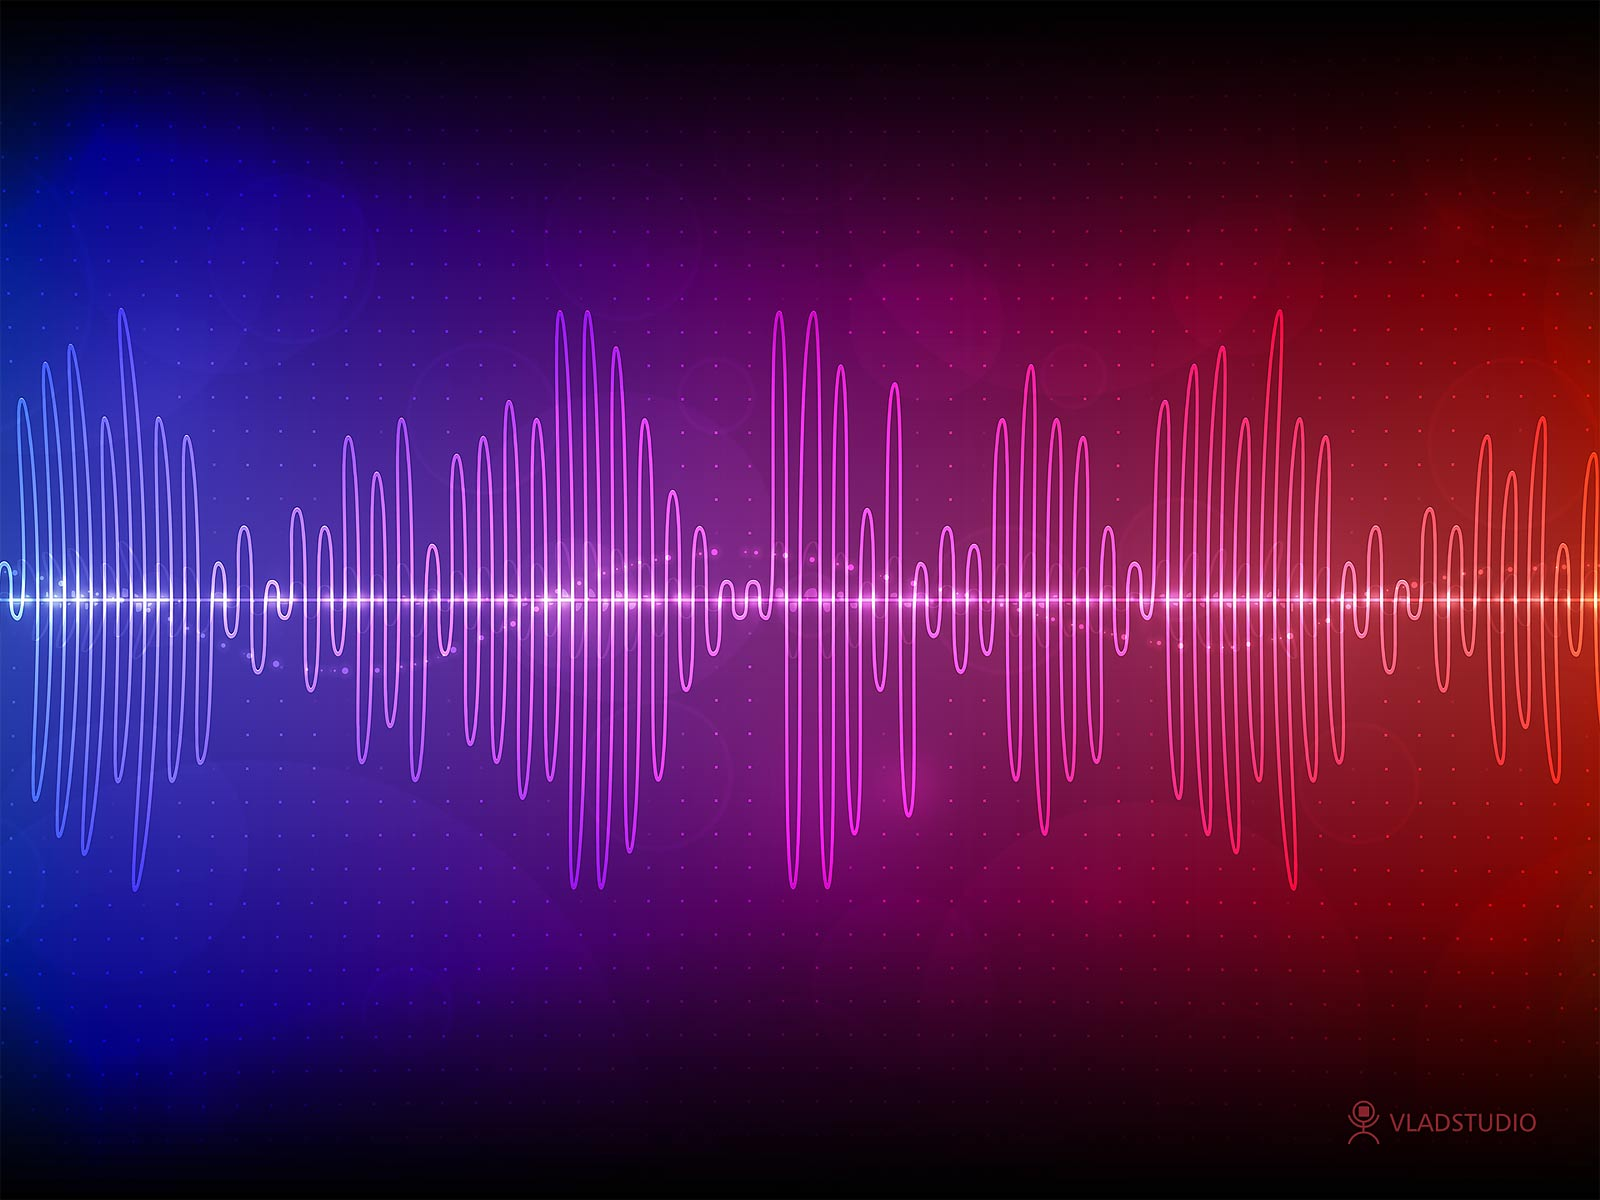 Sound Wave by vladstudio